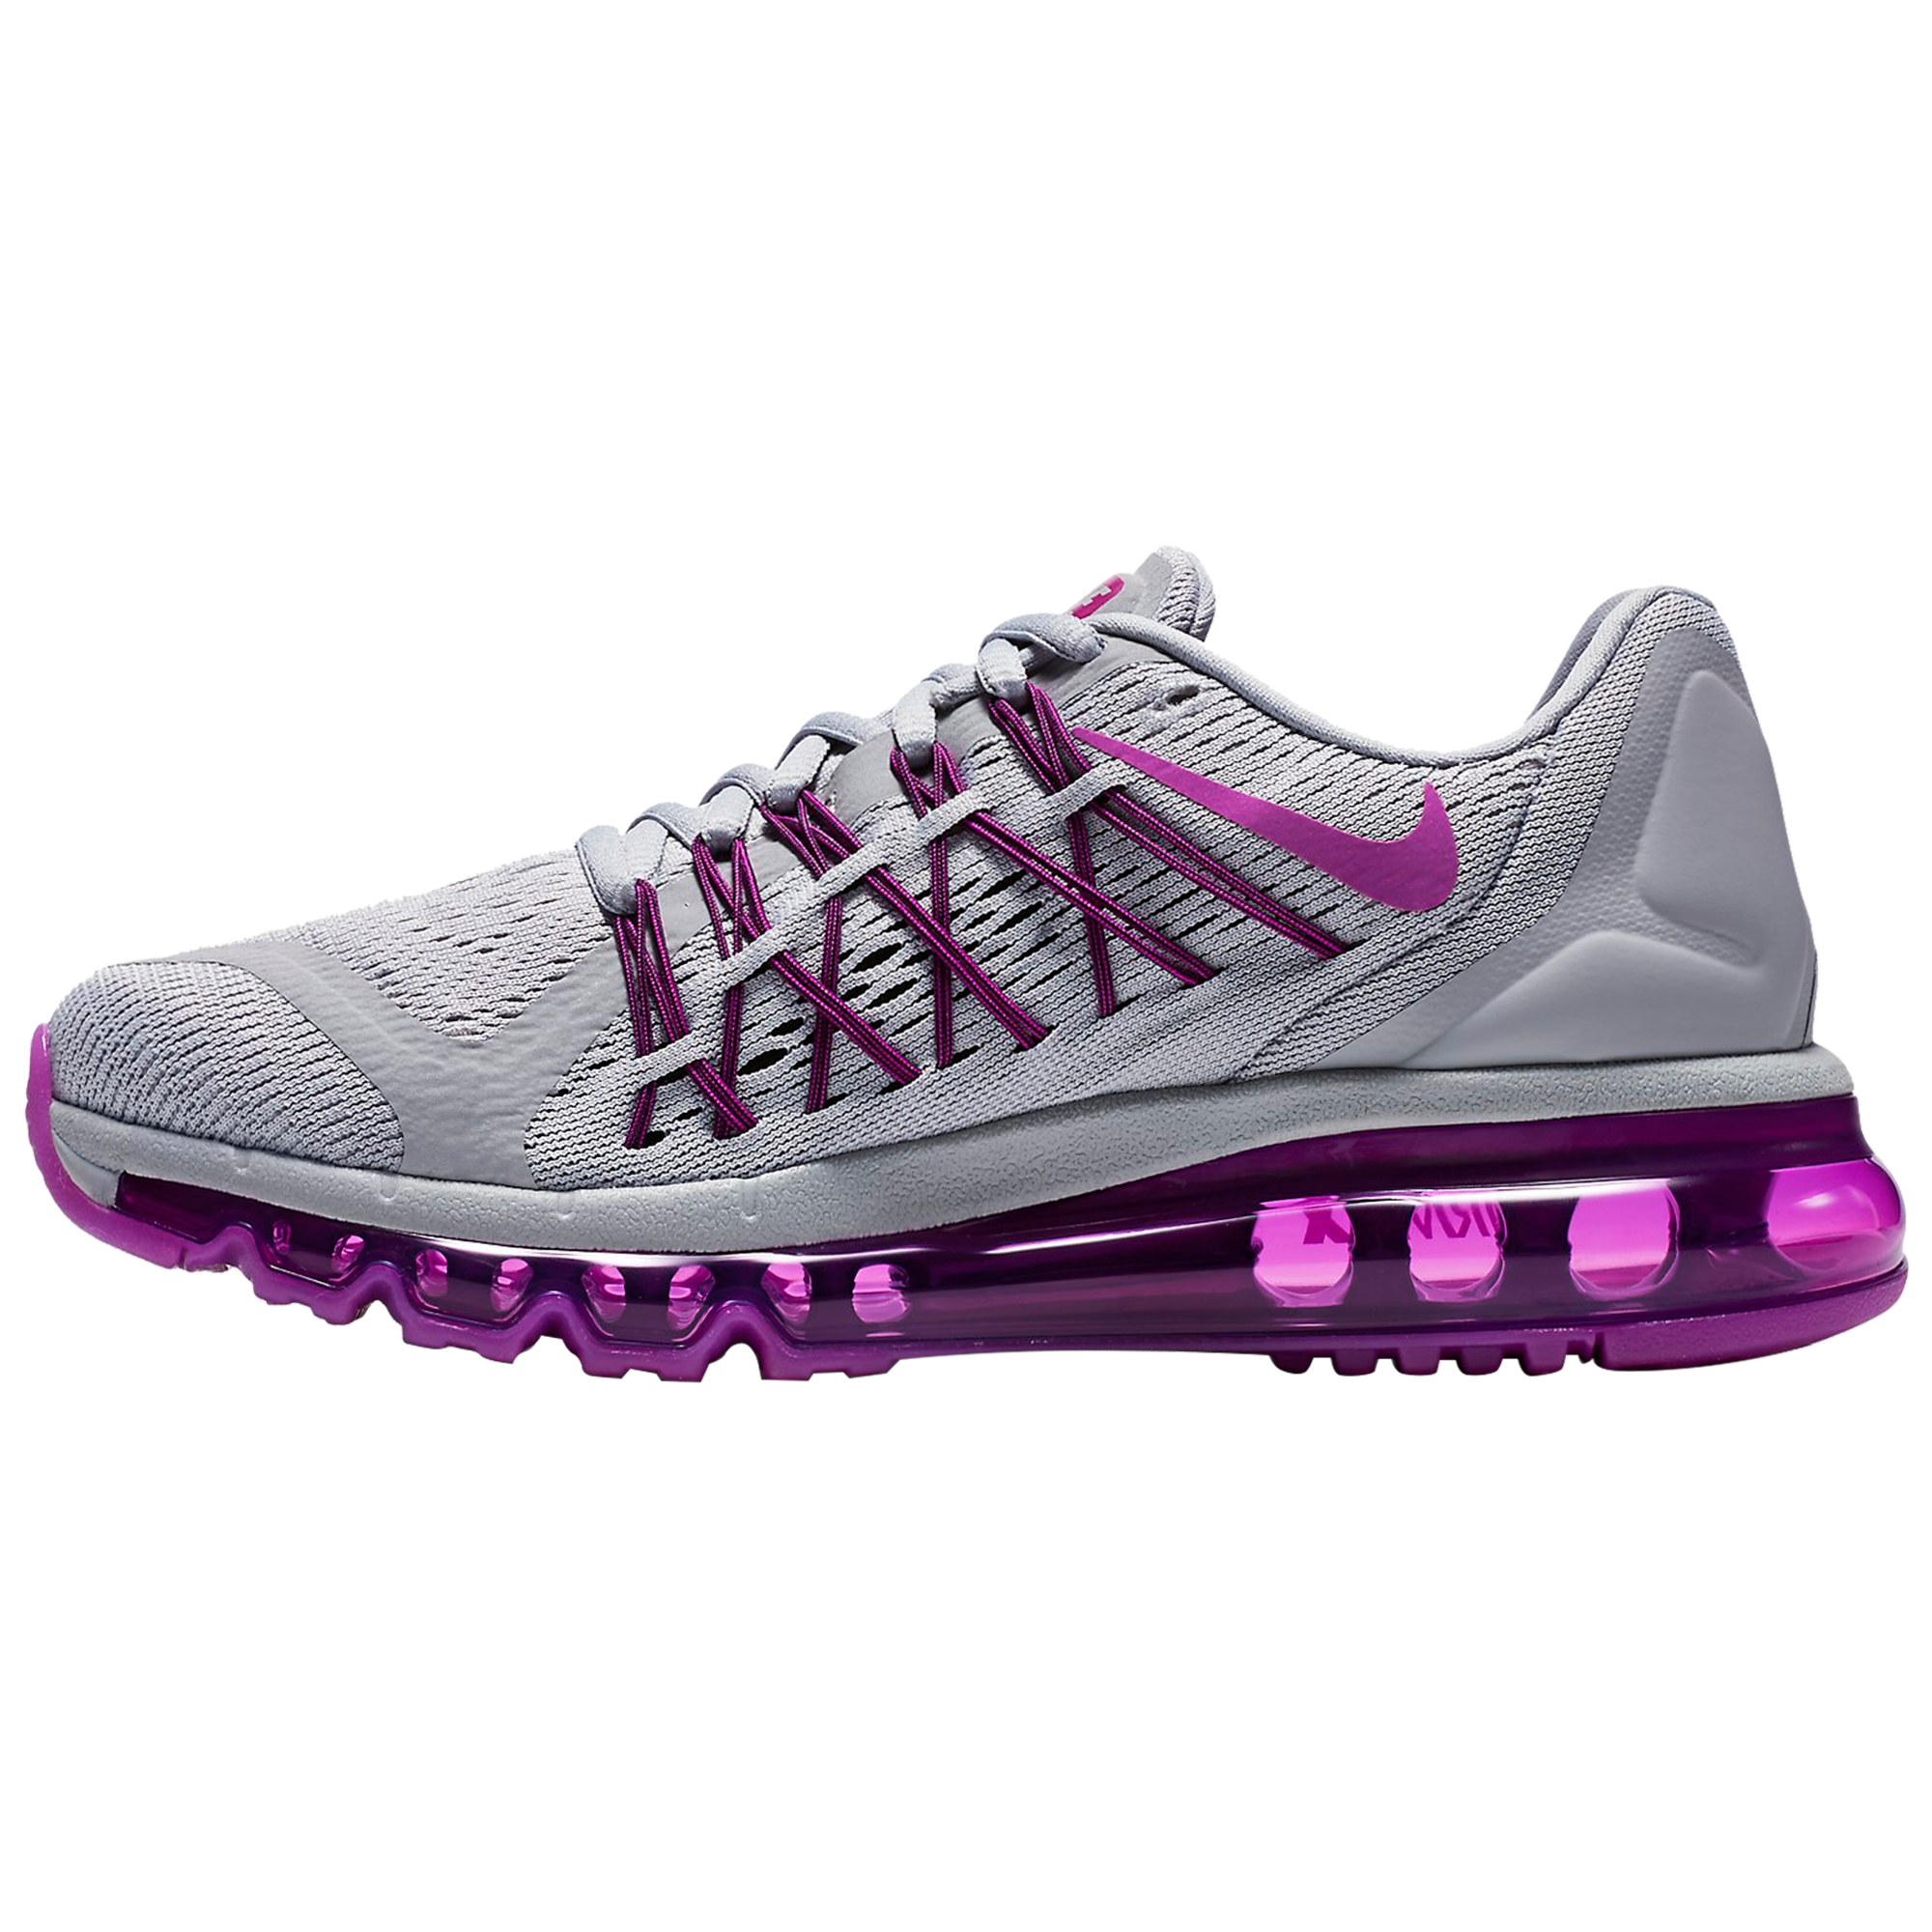 nike air max flyknit 2015 spor ayakkabı